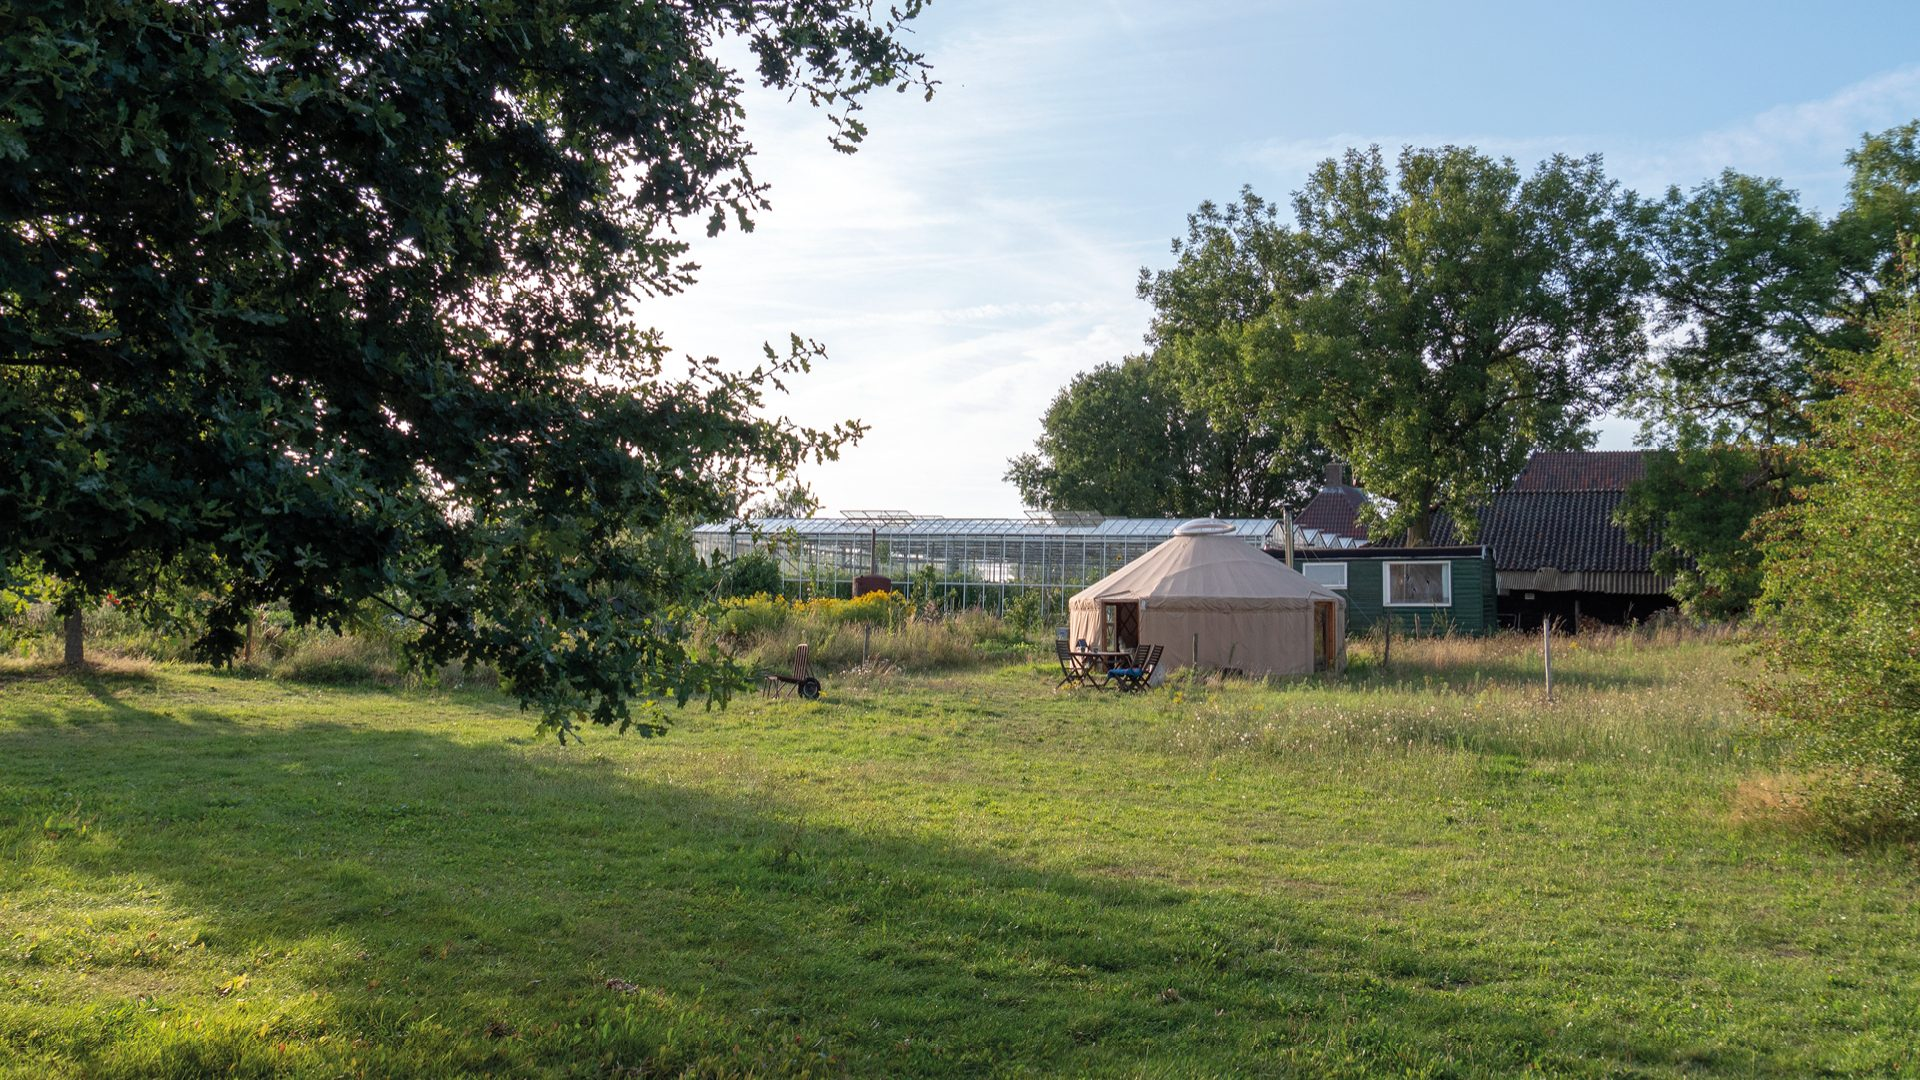 yurt-overnachten-nederland